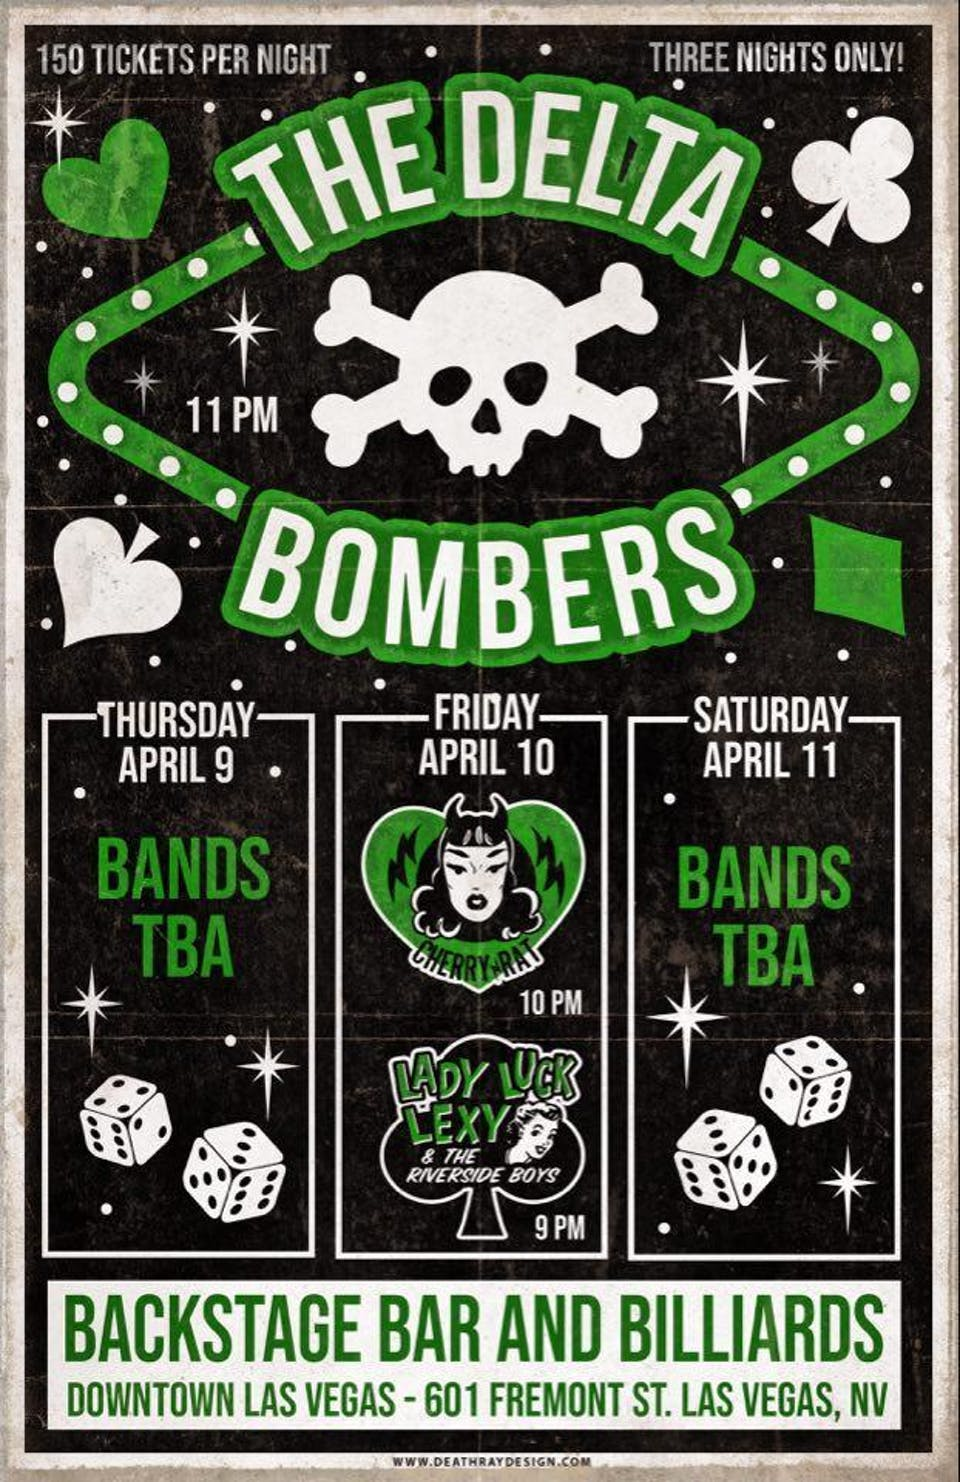 The Delta Bombers Thursday